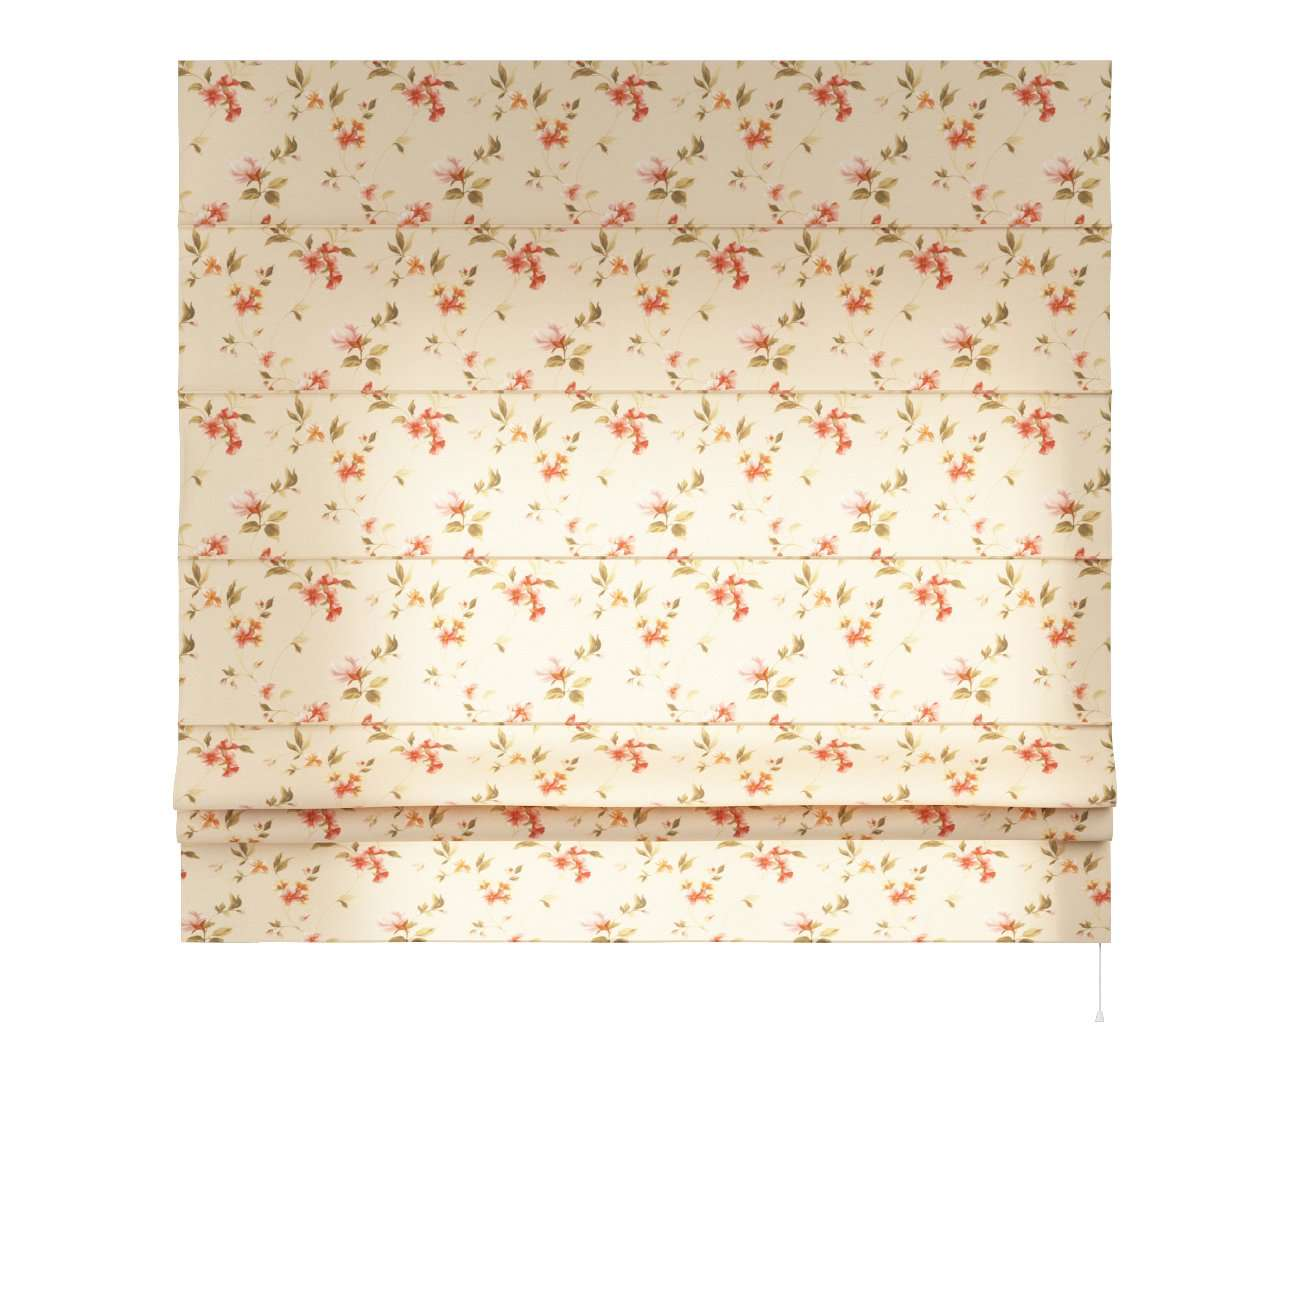 Romanetės Padva 80 x 170 cm (plotis x ilgis) kolekcijoje Londres, audinys: 124-05